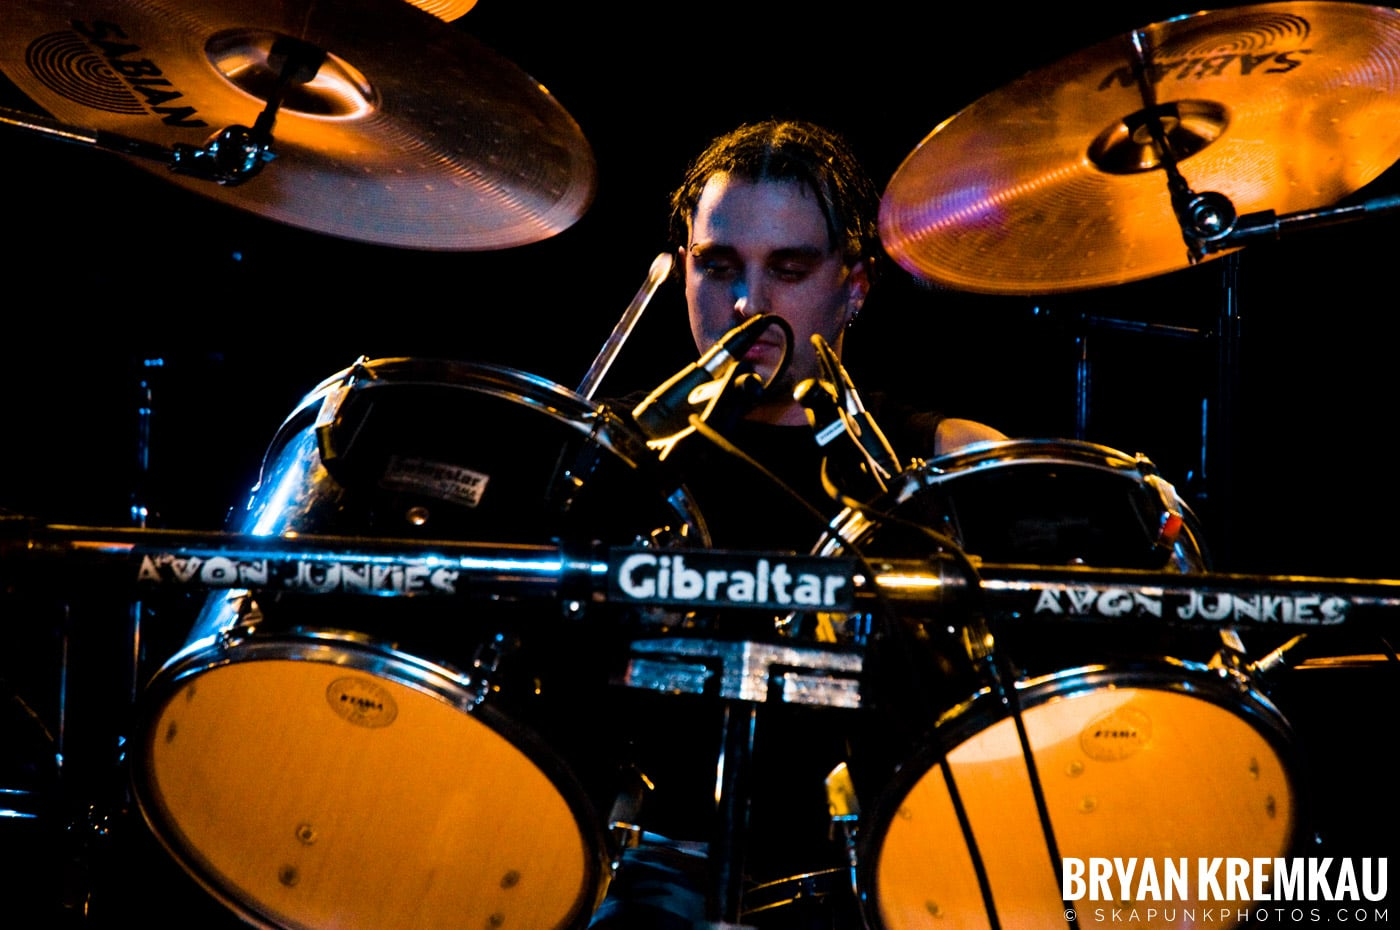 Avon Junkies (Ska is Dead Tour) @ Starland Ballroom, Sayreville, NJ - 11.15.09 (6)